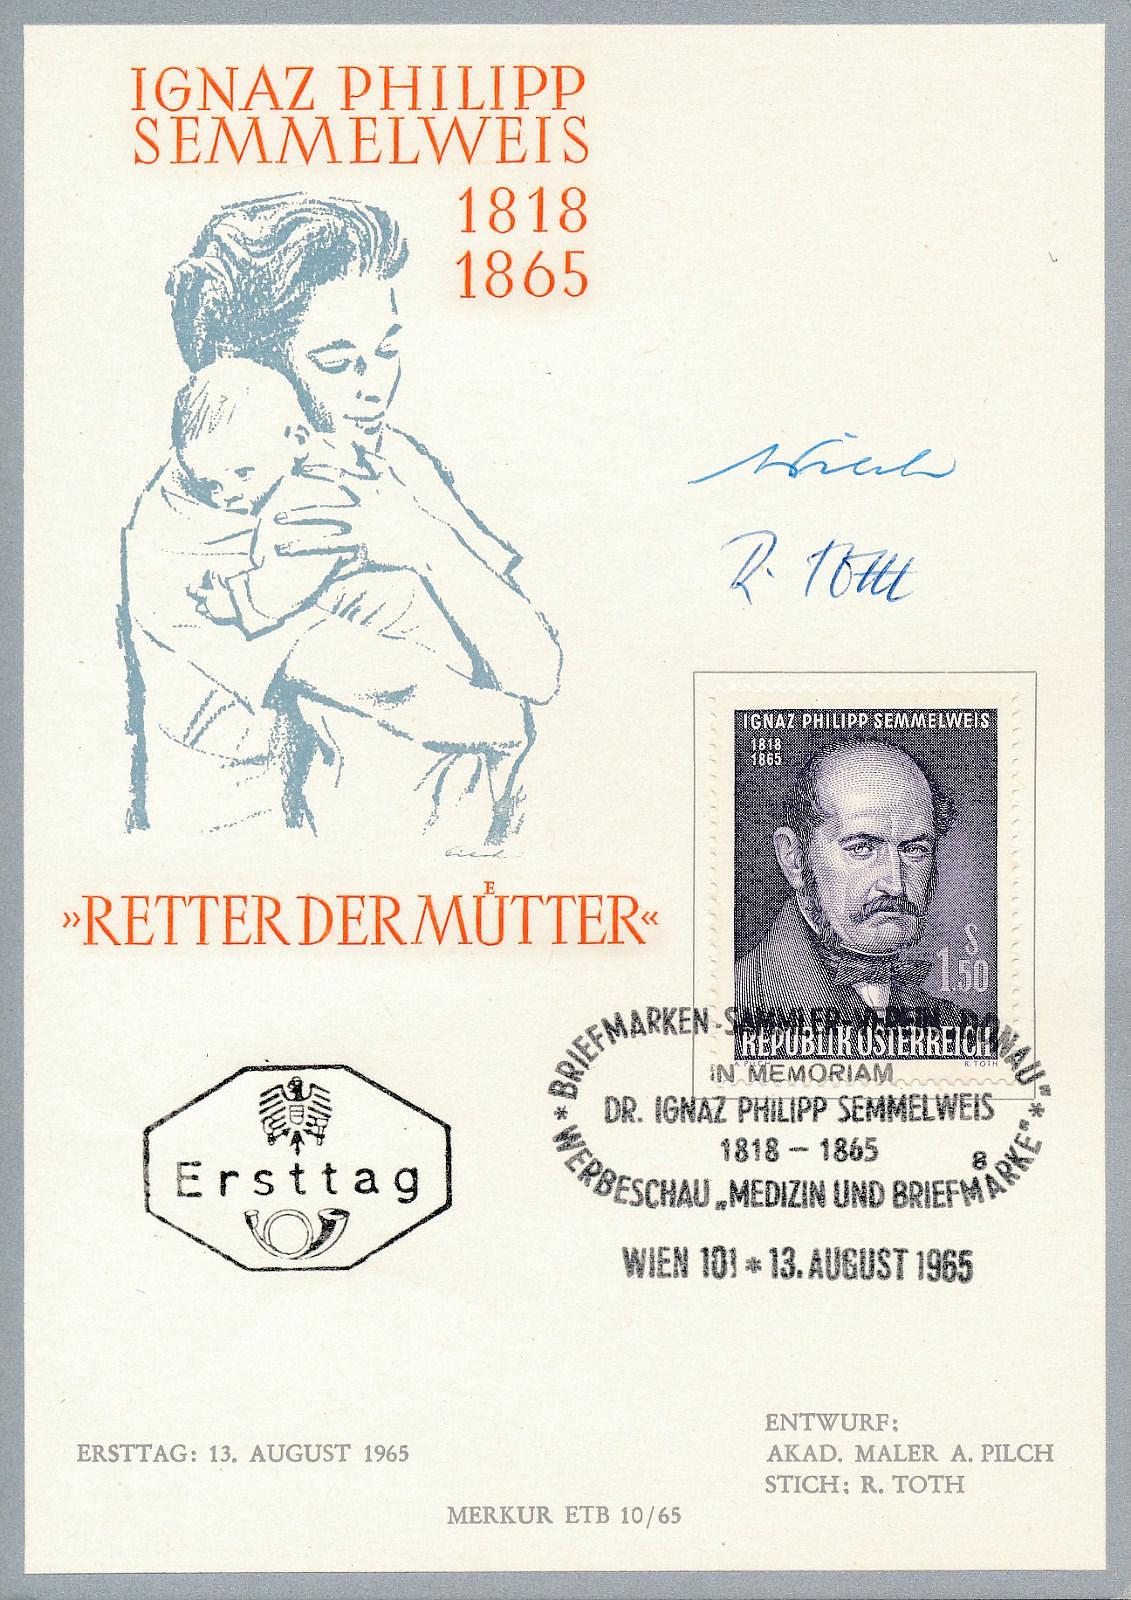 Semmelweis2-153320.jpg